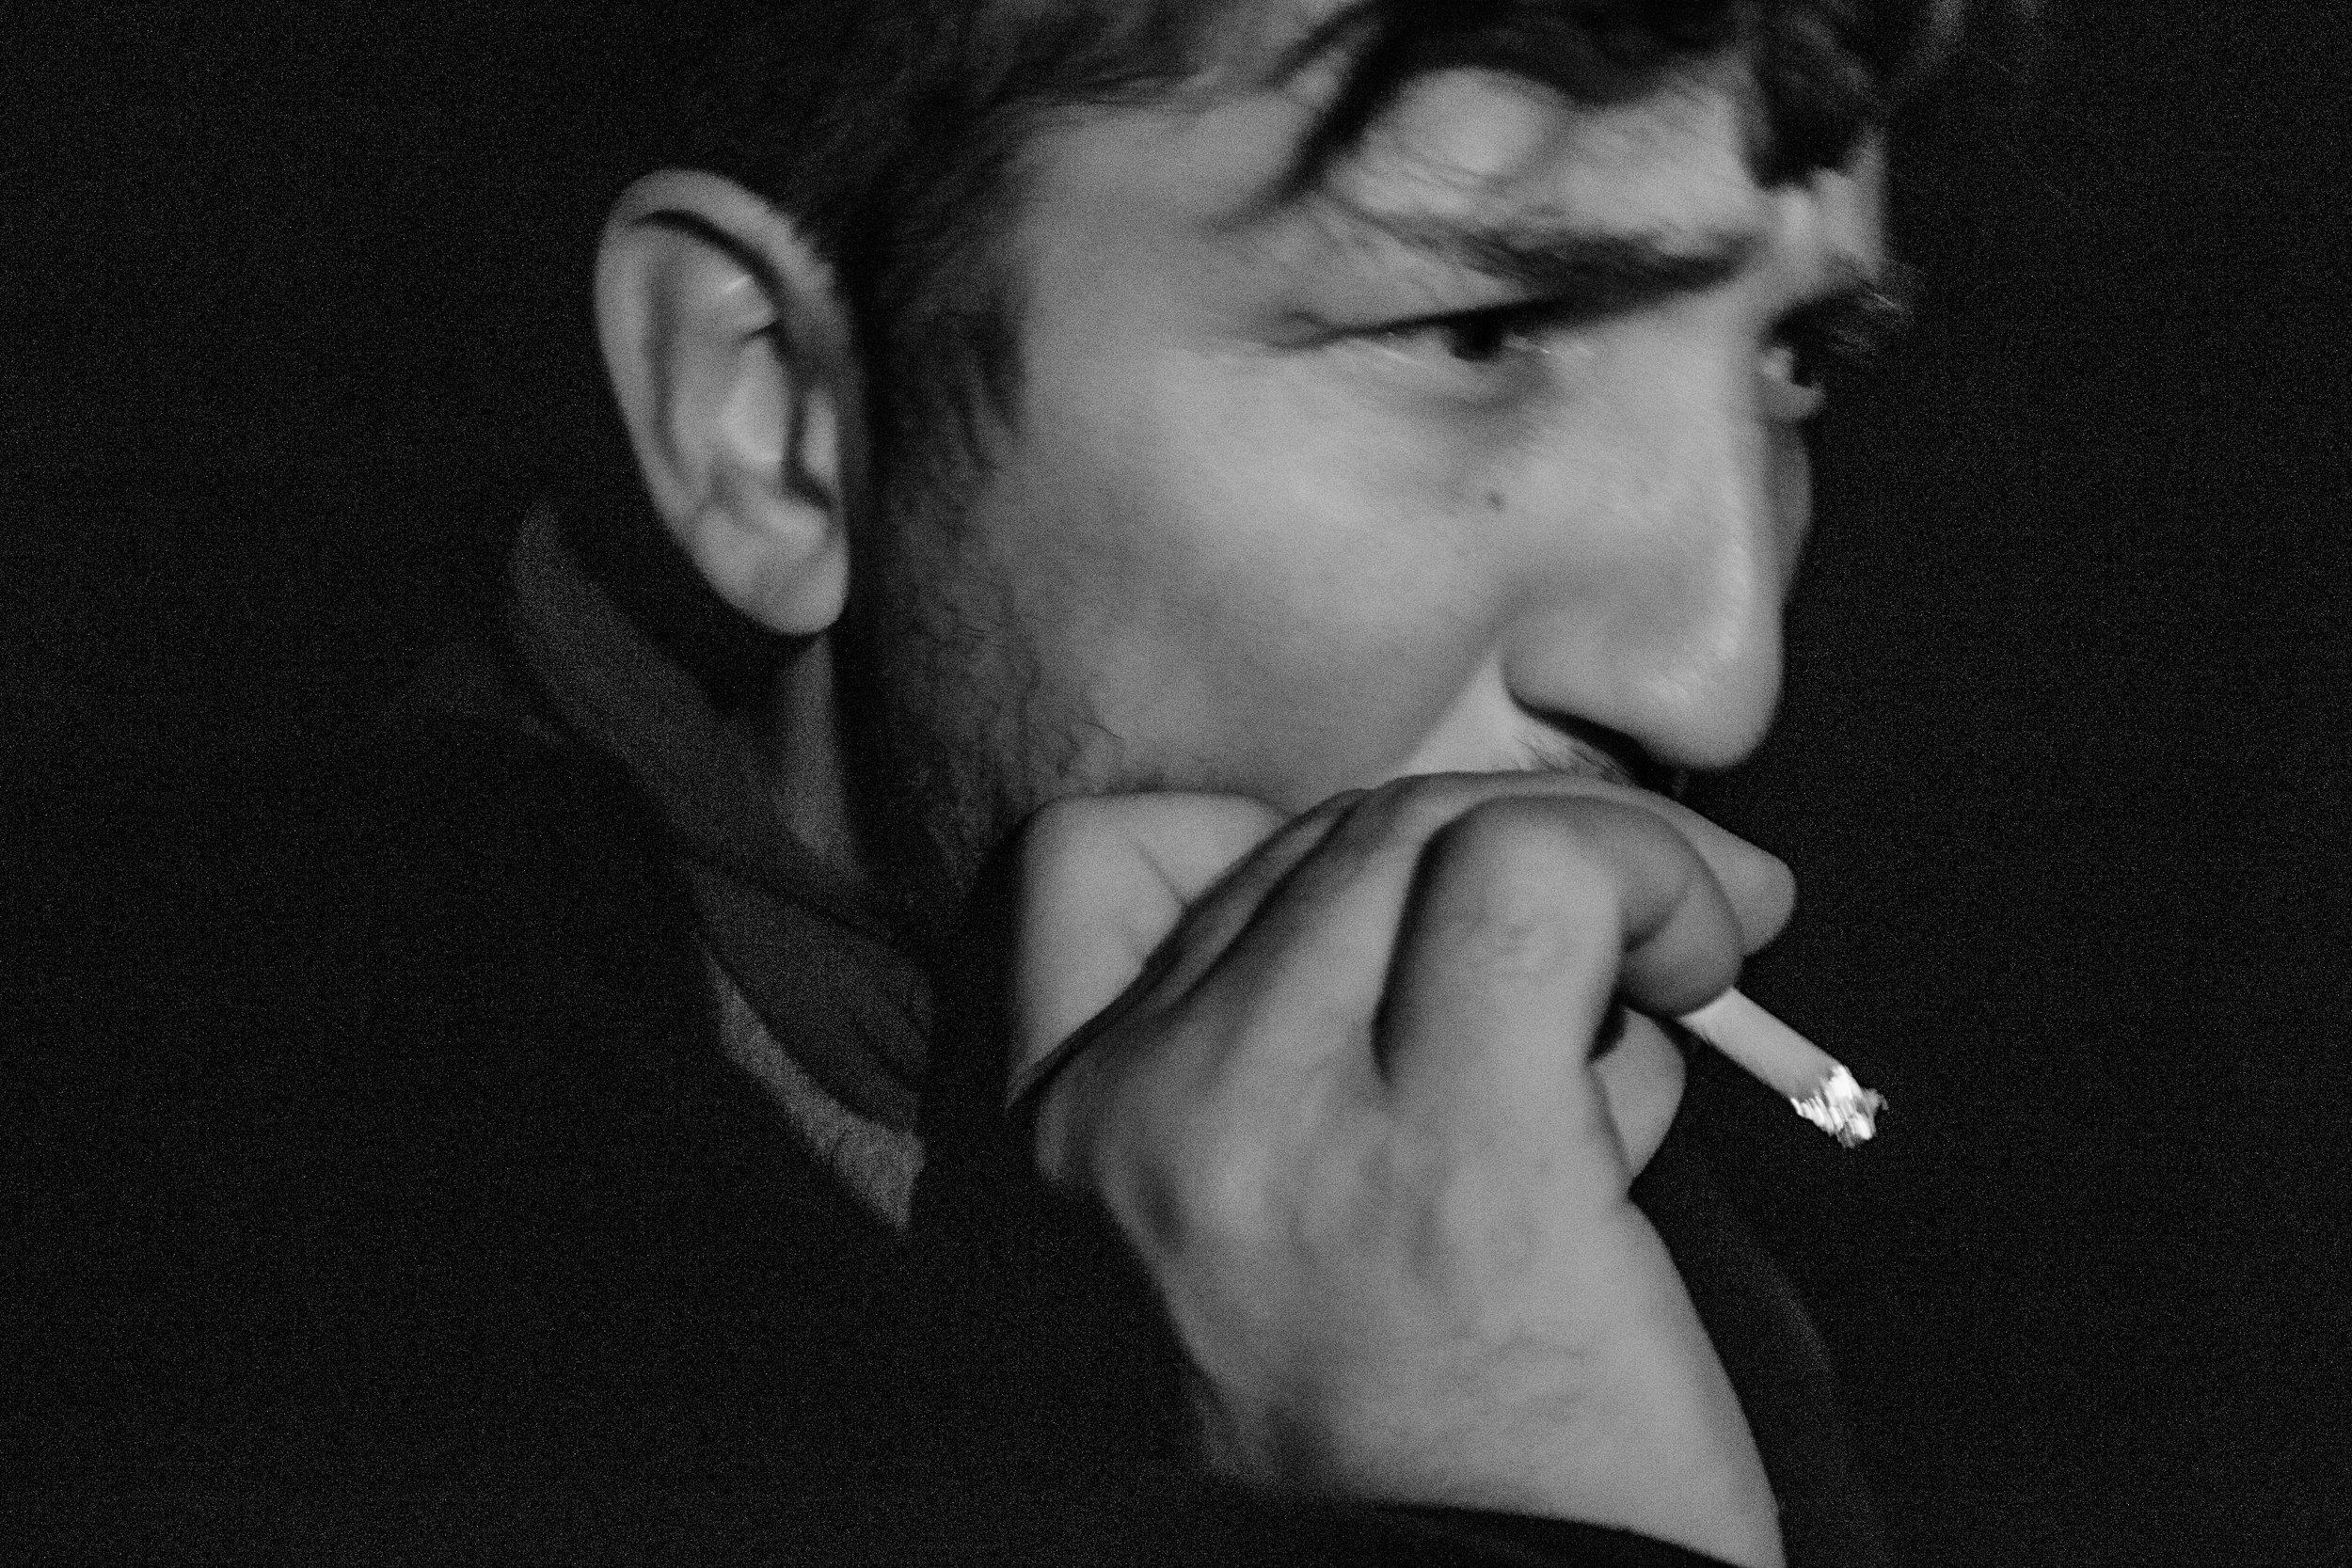 diego needs a cigarette after the scenario